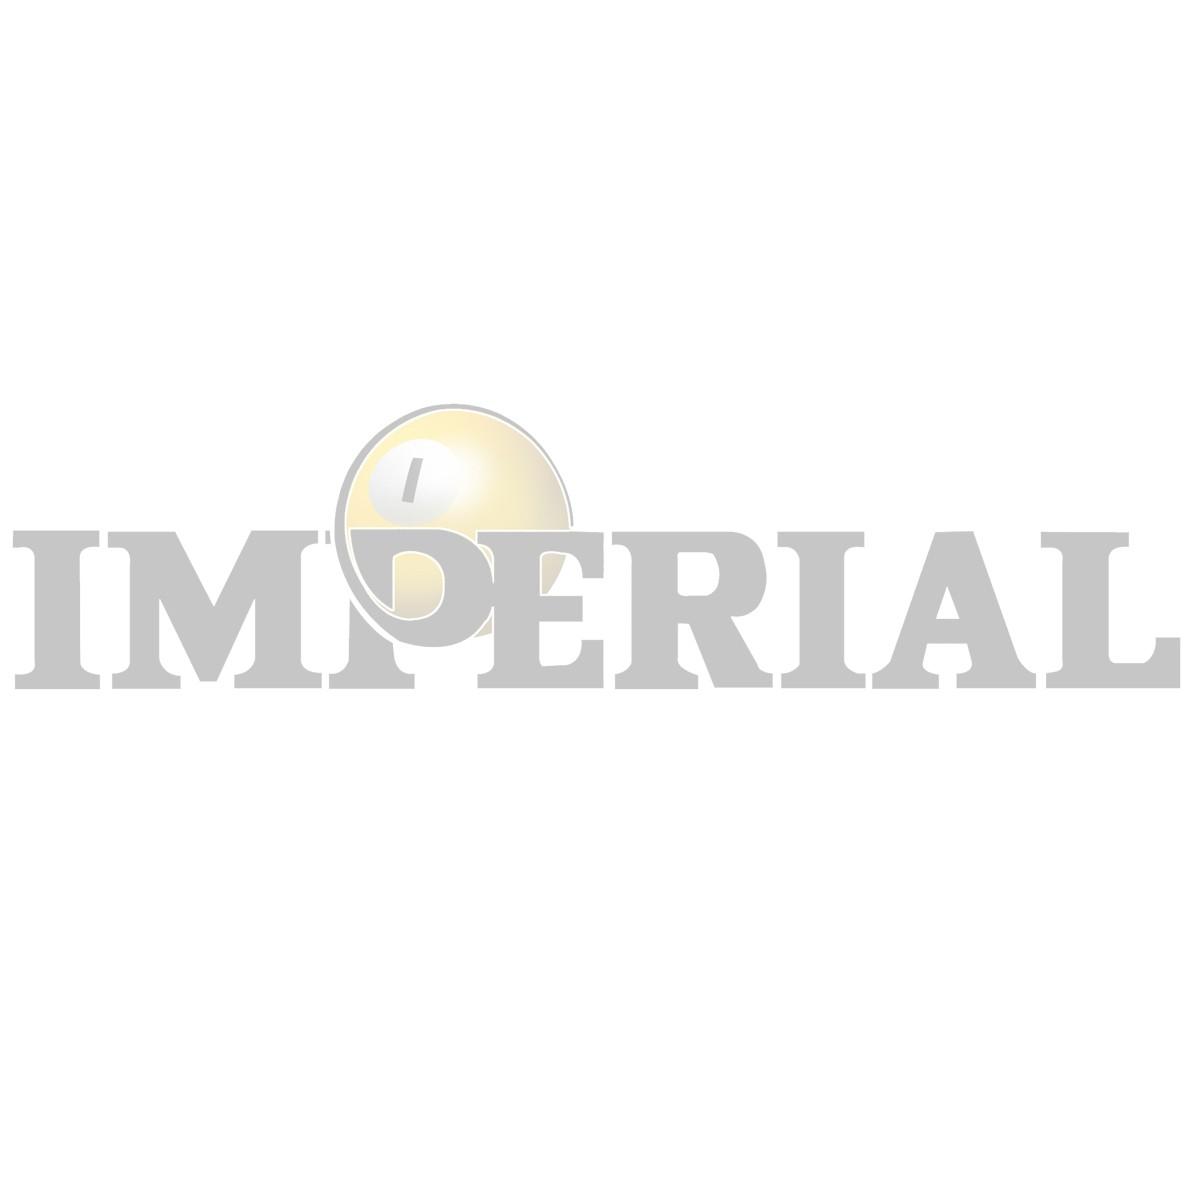 Kansas State University Home vs. Away Billiard Ball Set